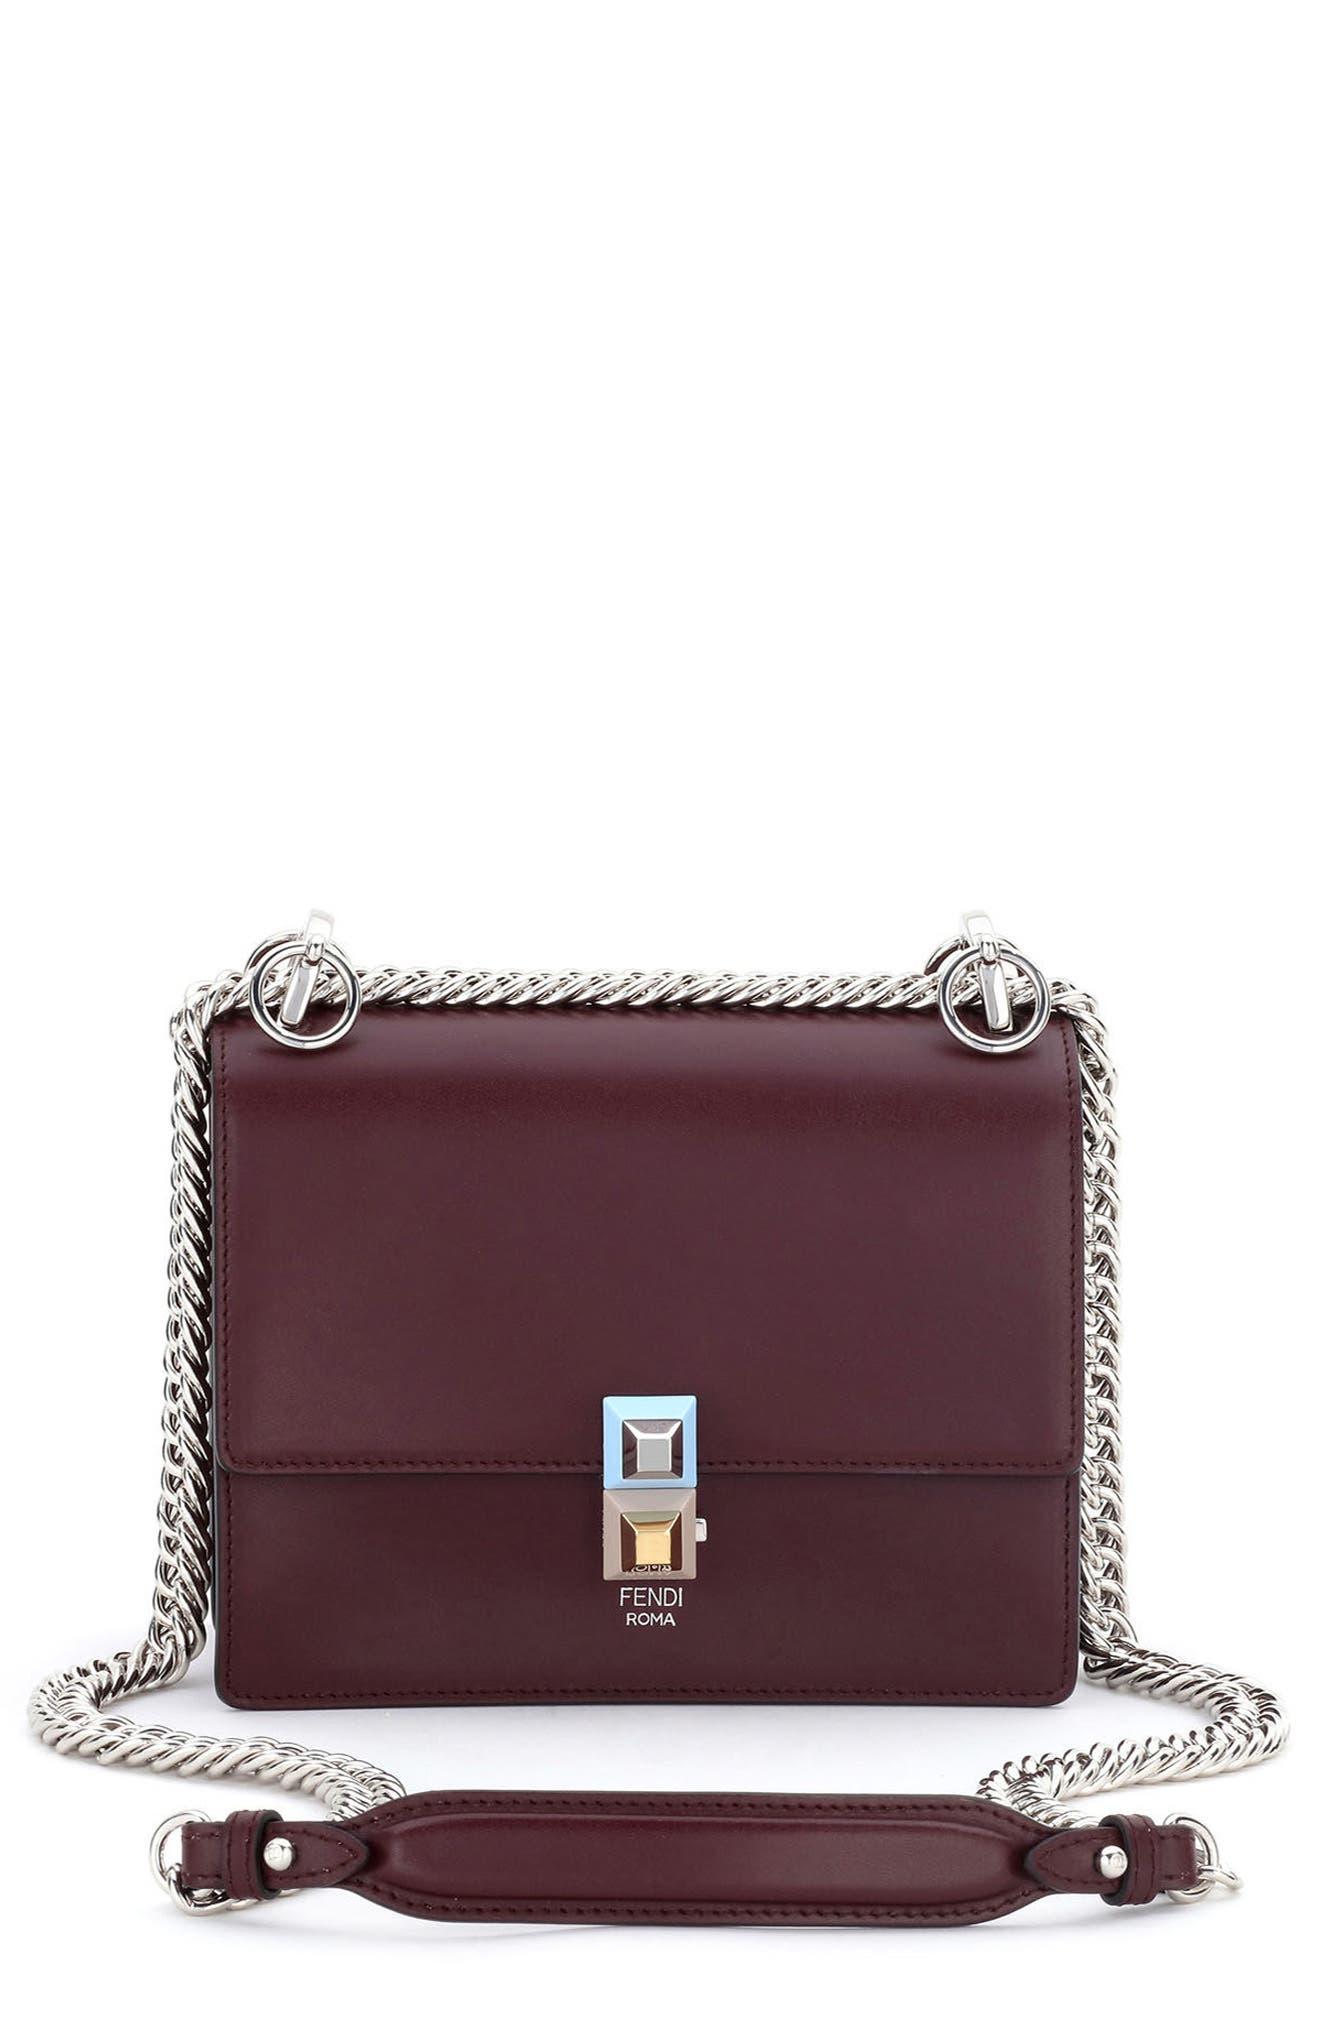 FENDI Small Kan I Leather Bag